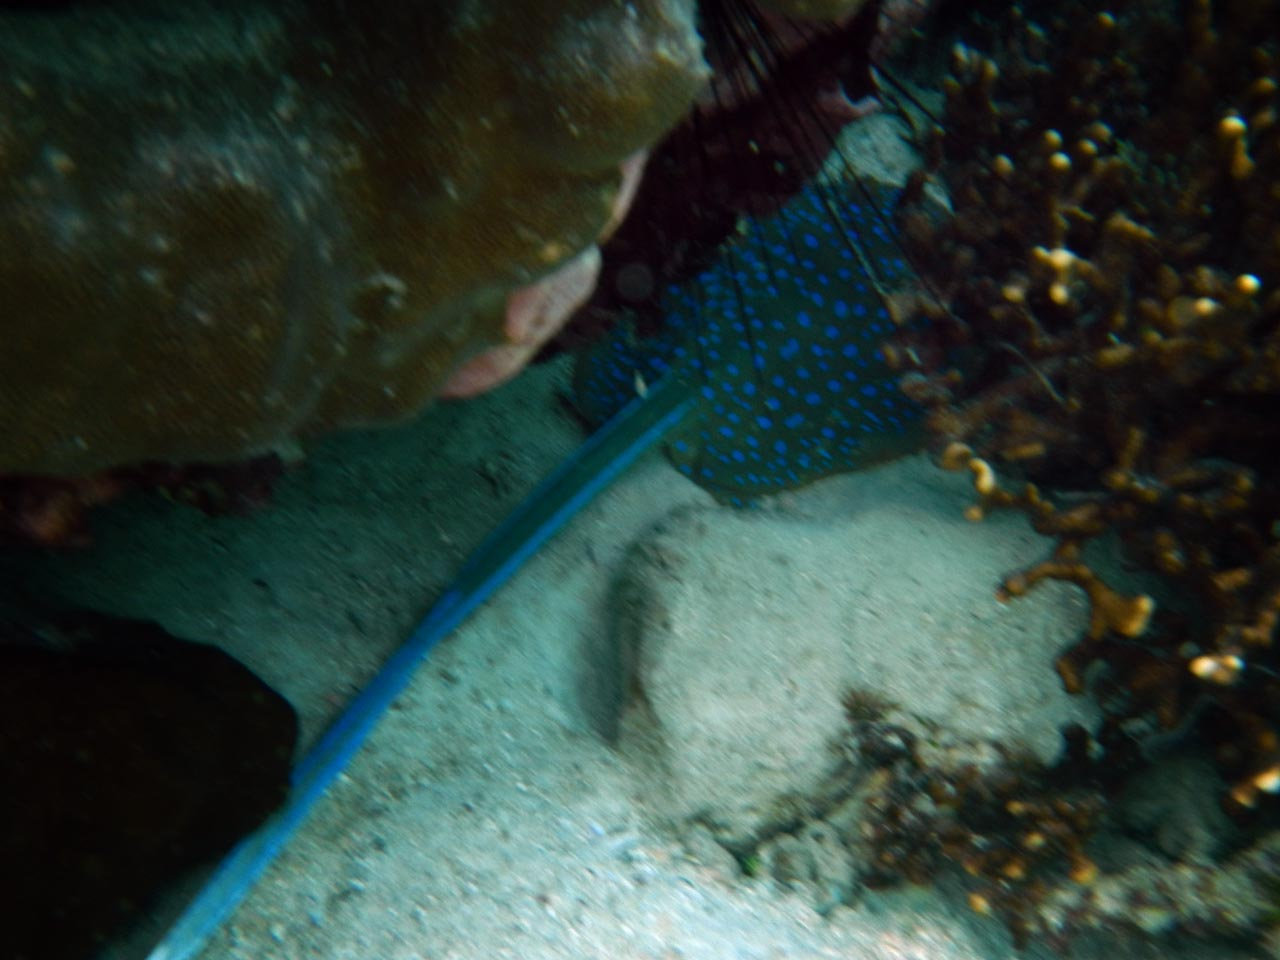 wisata pulau pahawang - pahawang island lampung - yopie pangkey 4